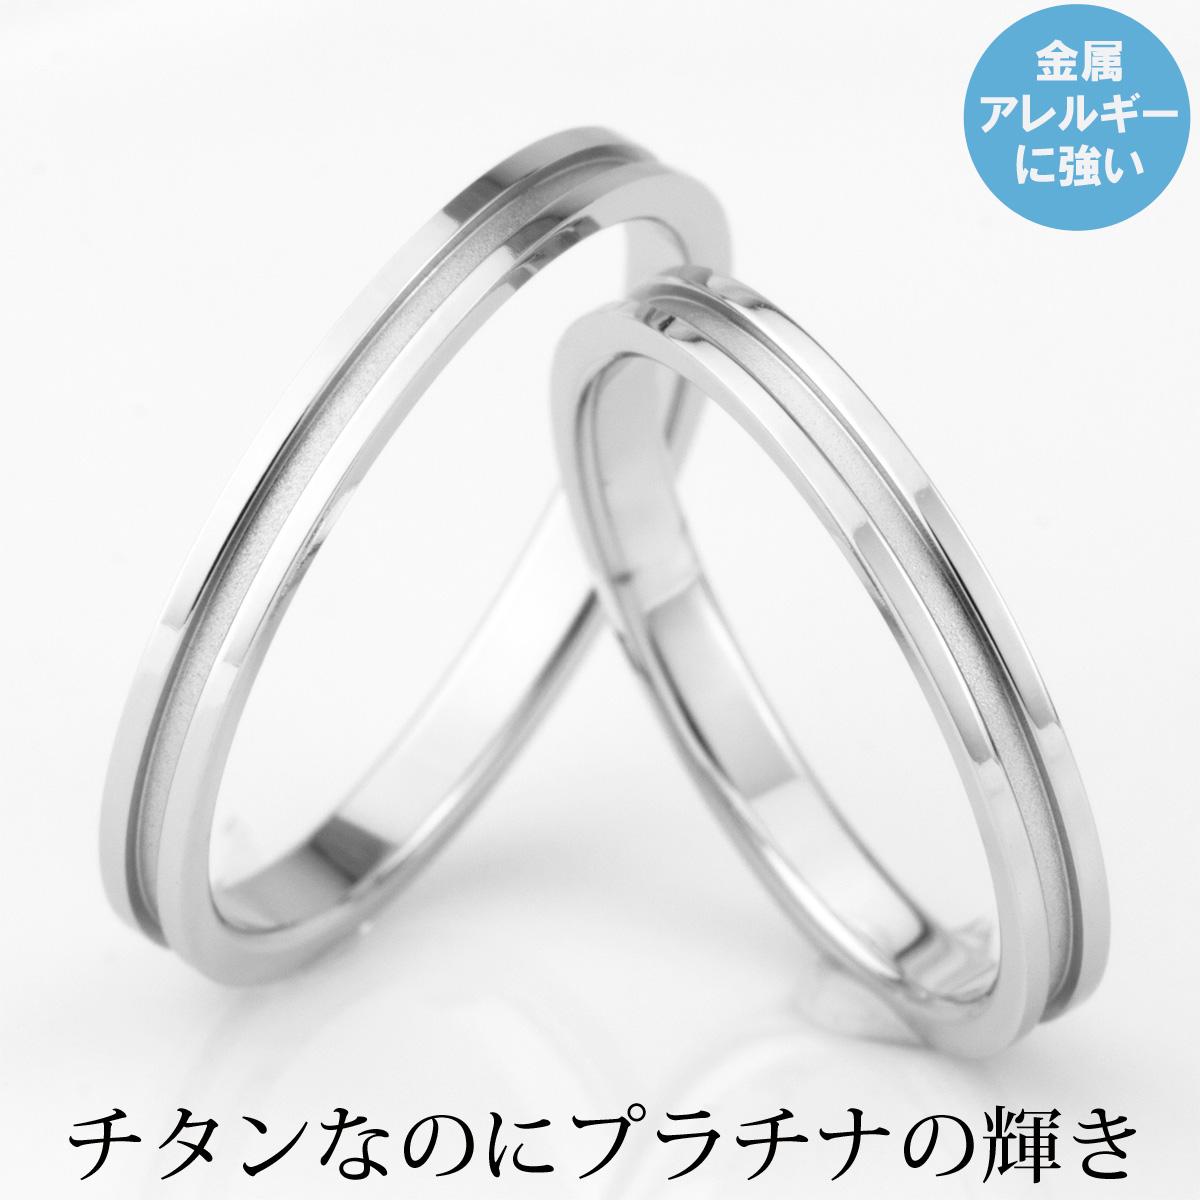 Platinum wedding ring allergy